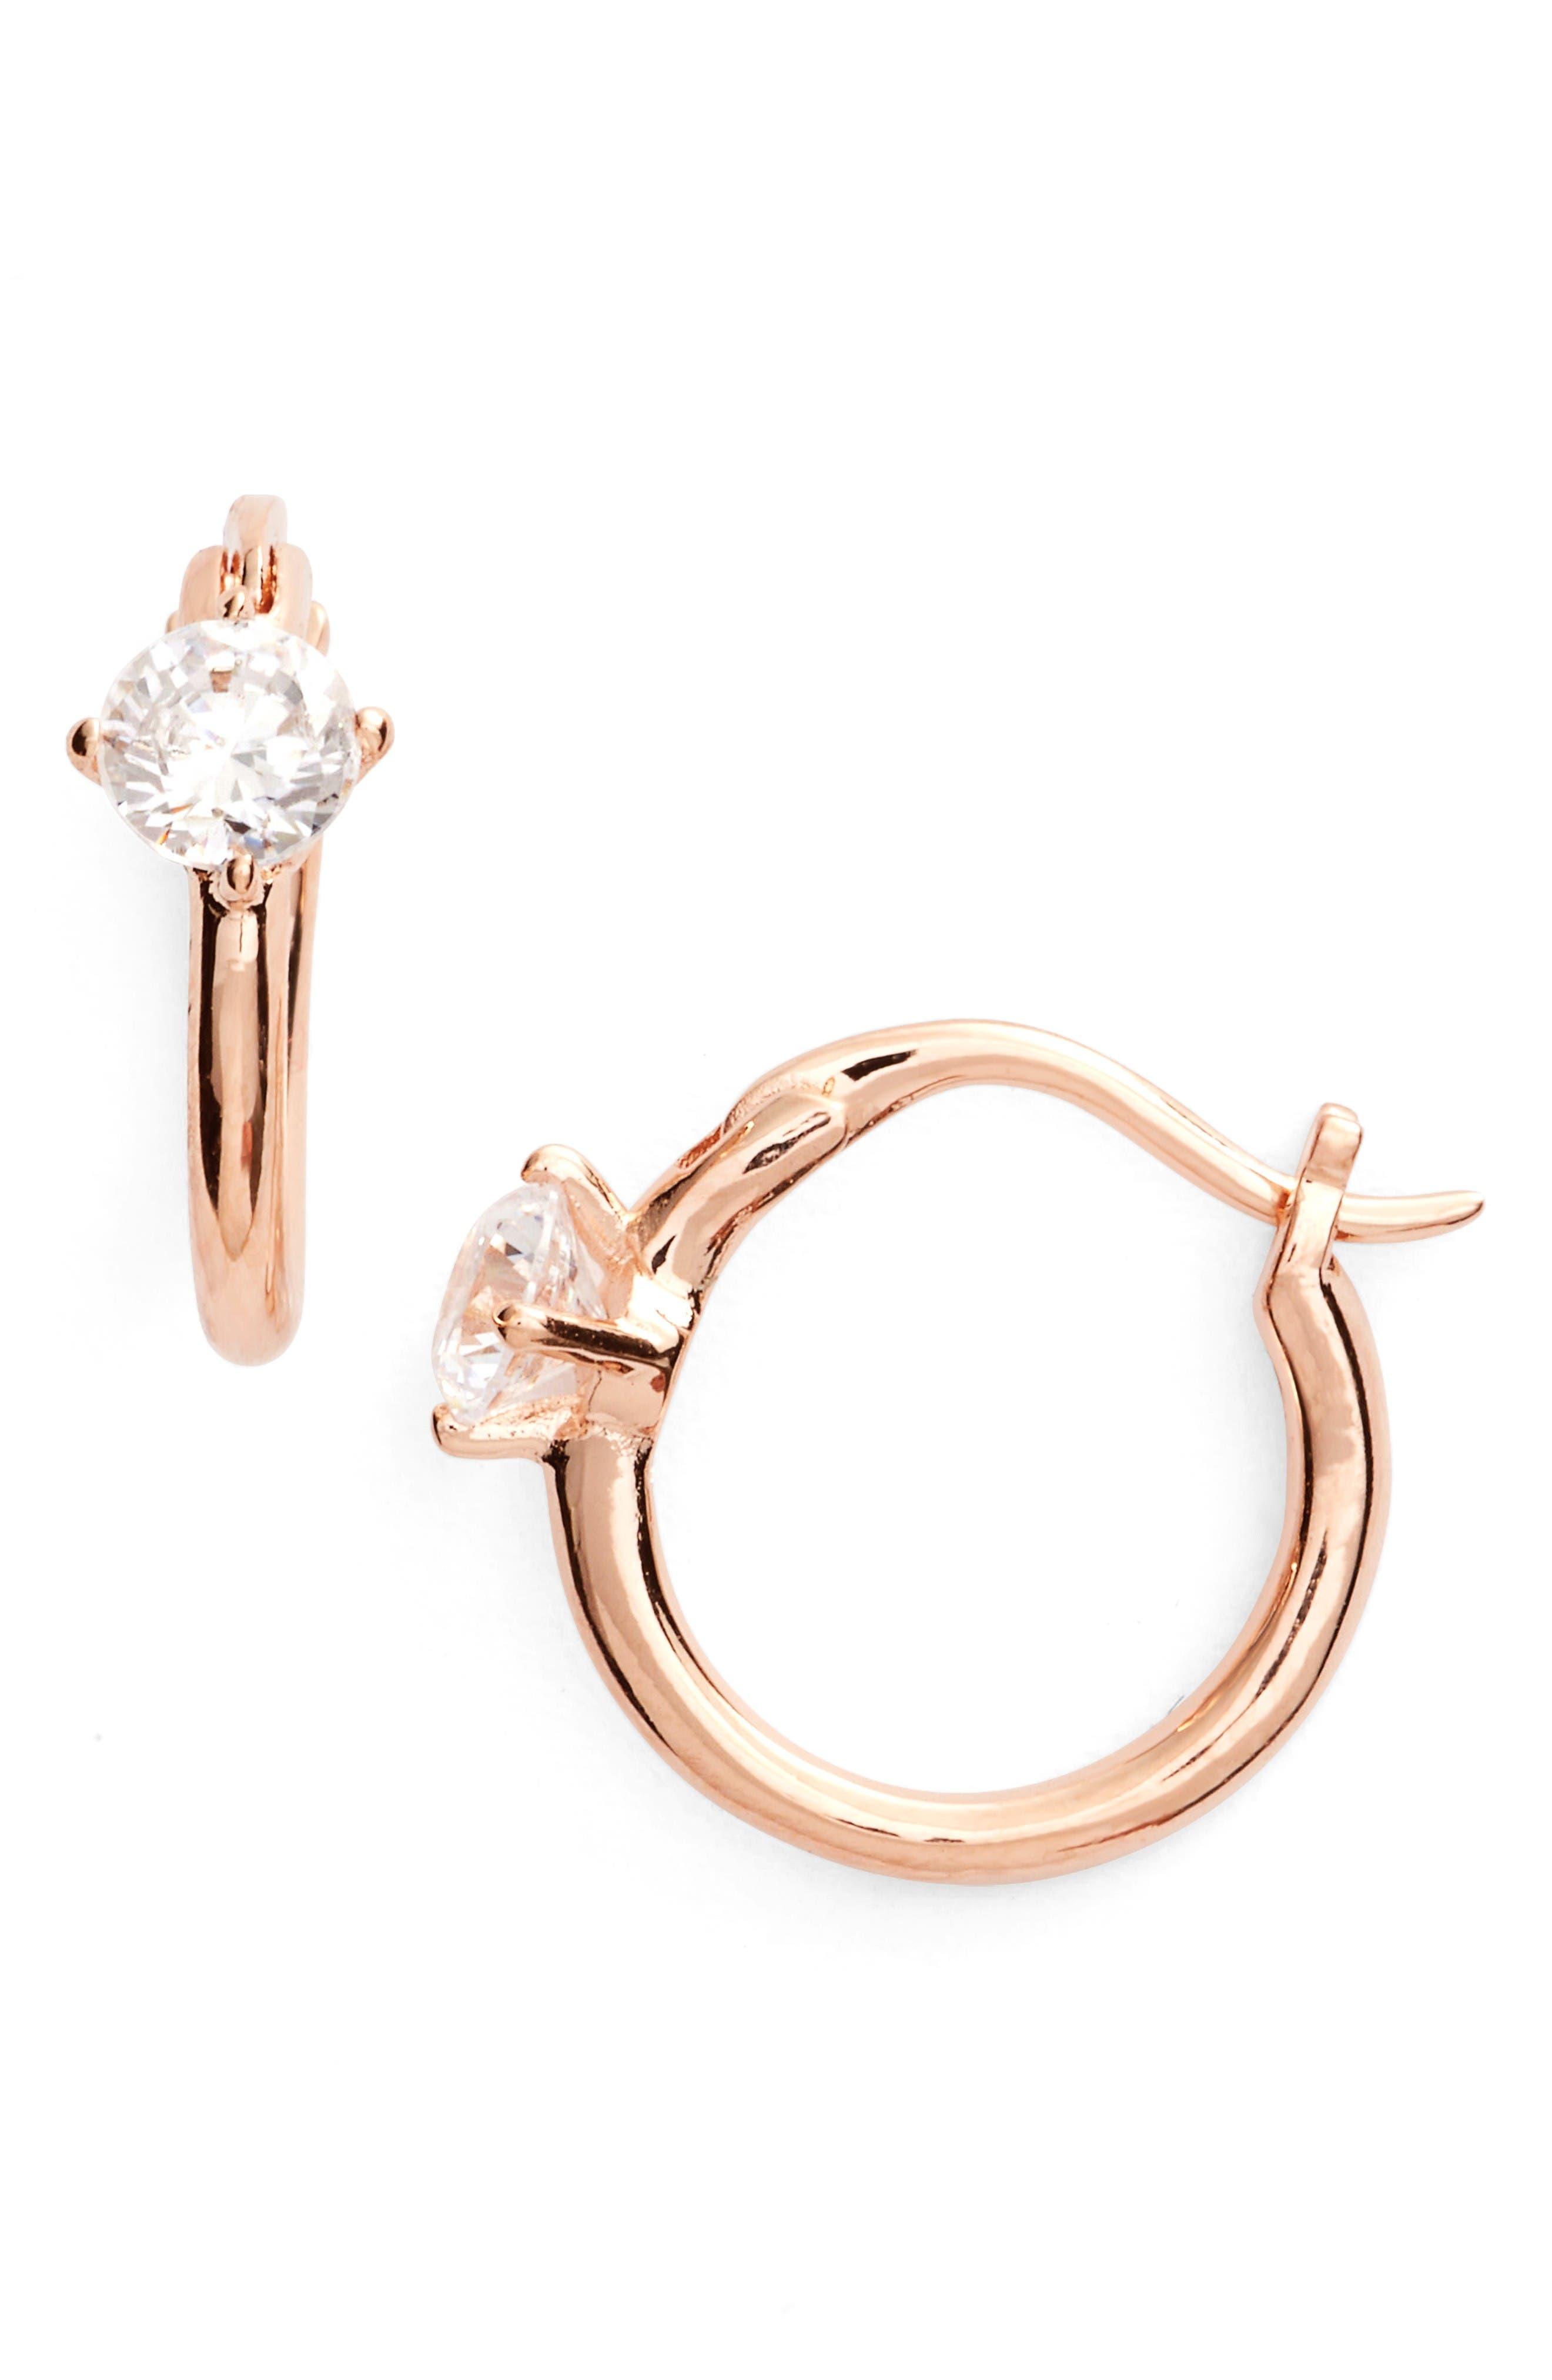 Jasmine Small Hoop Earrings,                         Main,                         color, Rose Gold